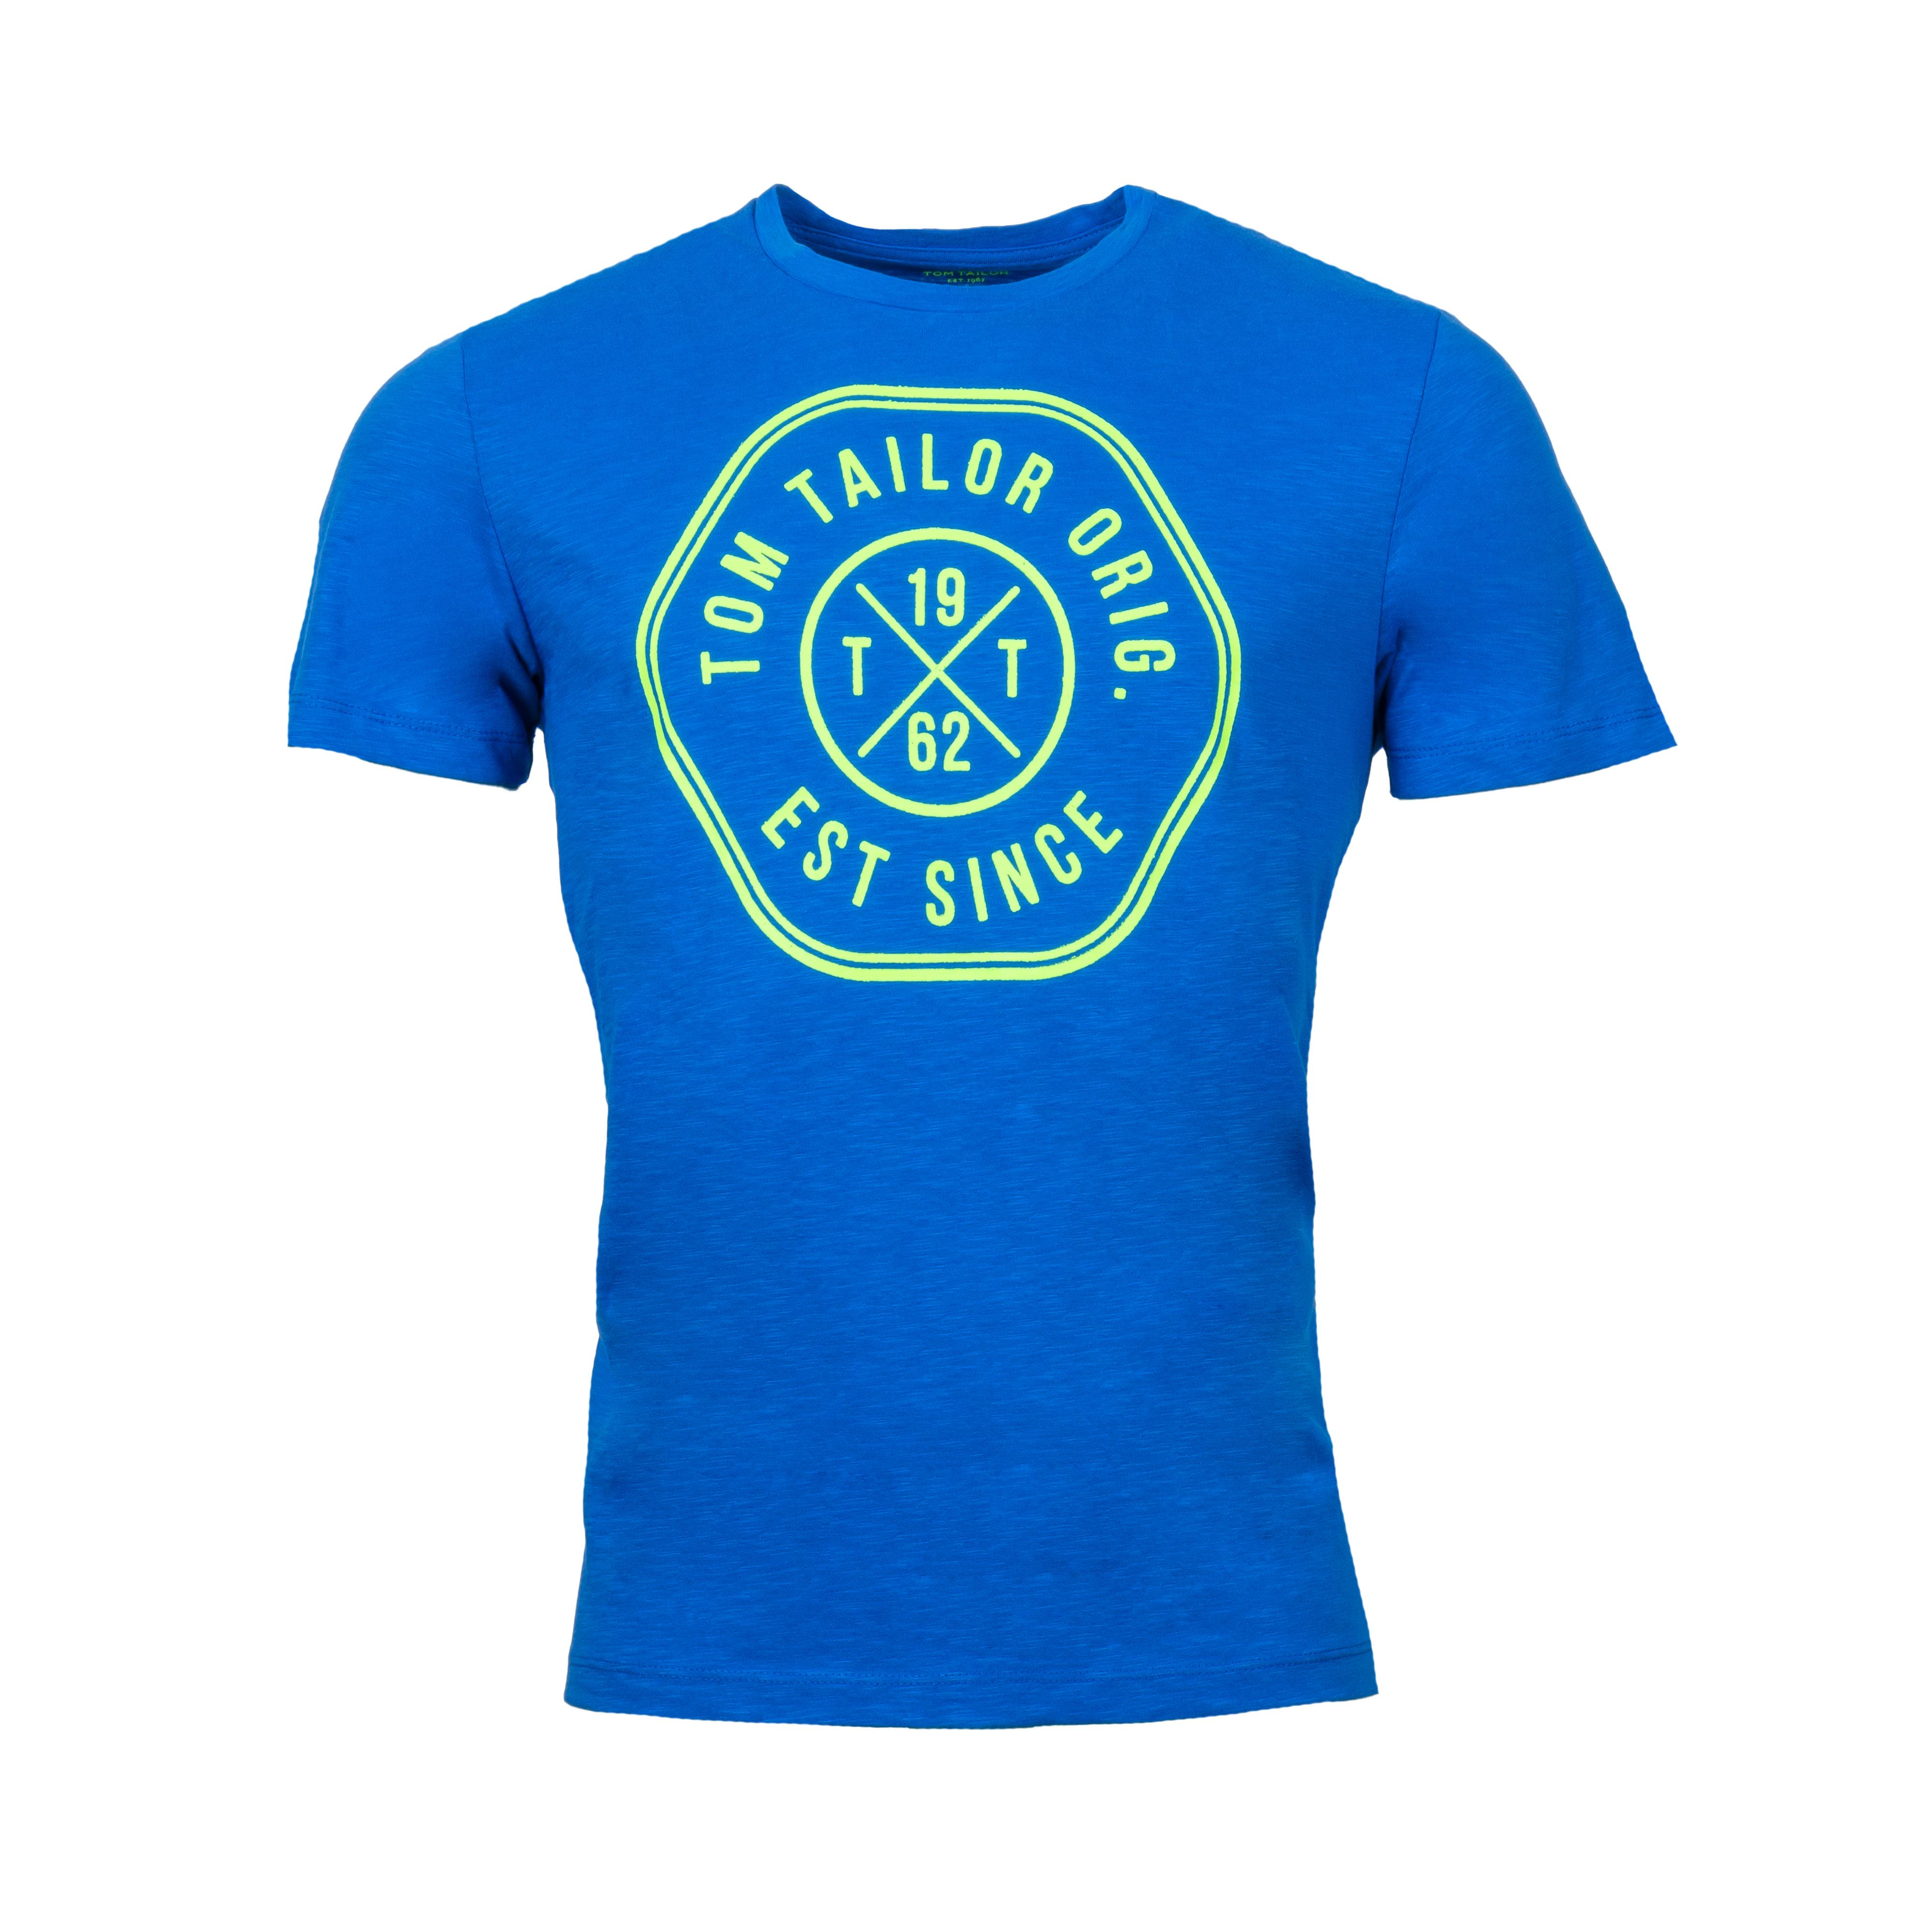 Tee-shirt  en coton bleu floqué vert fluo